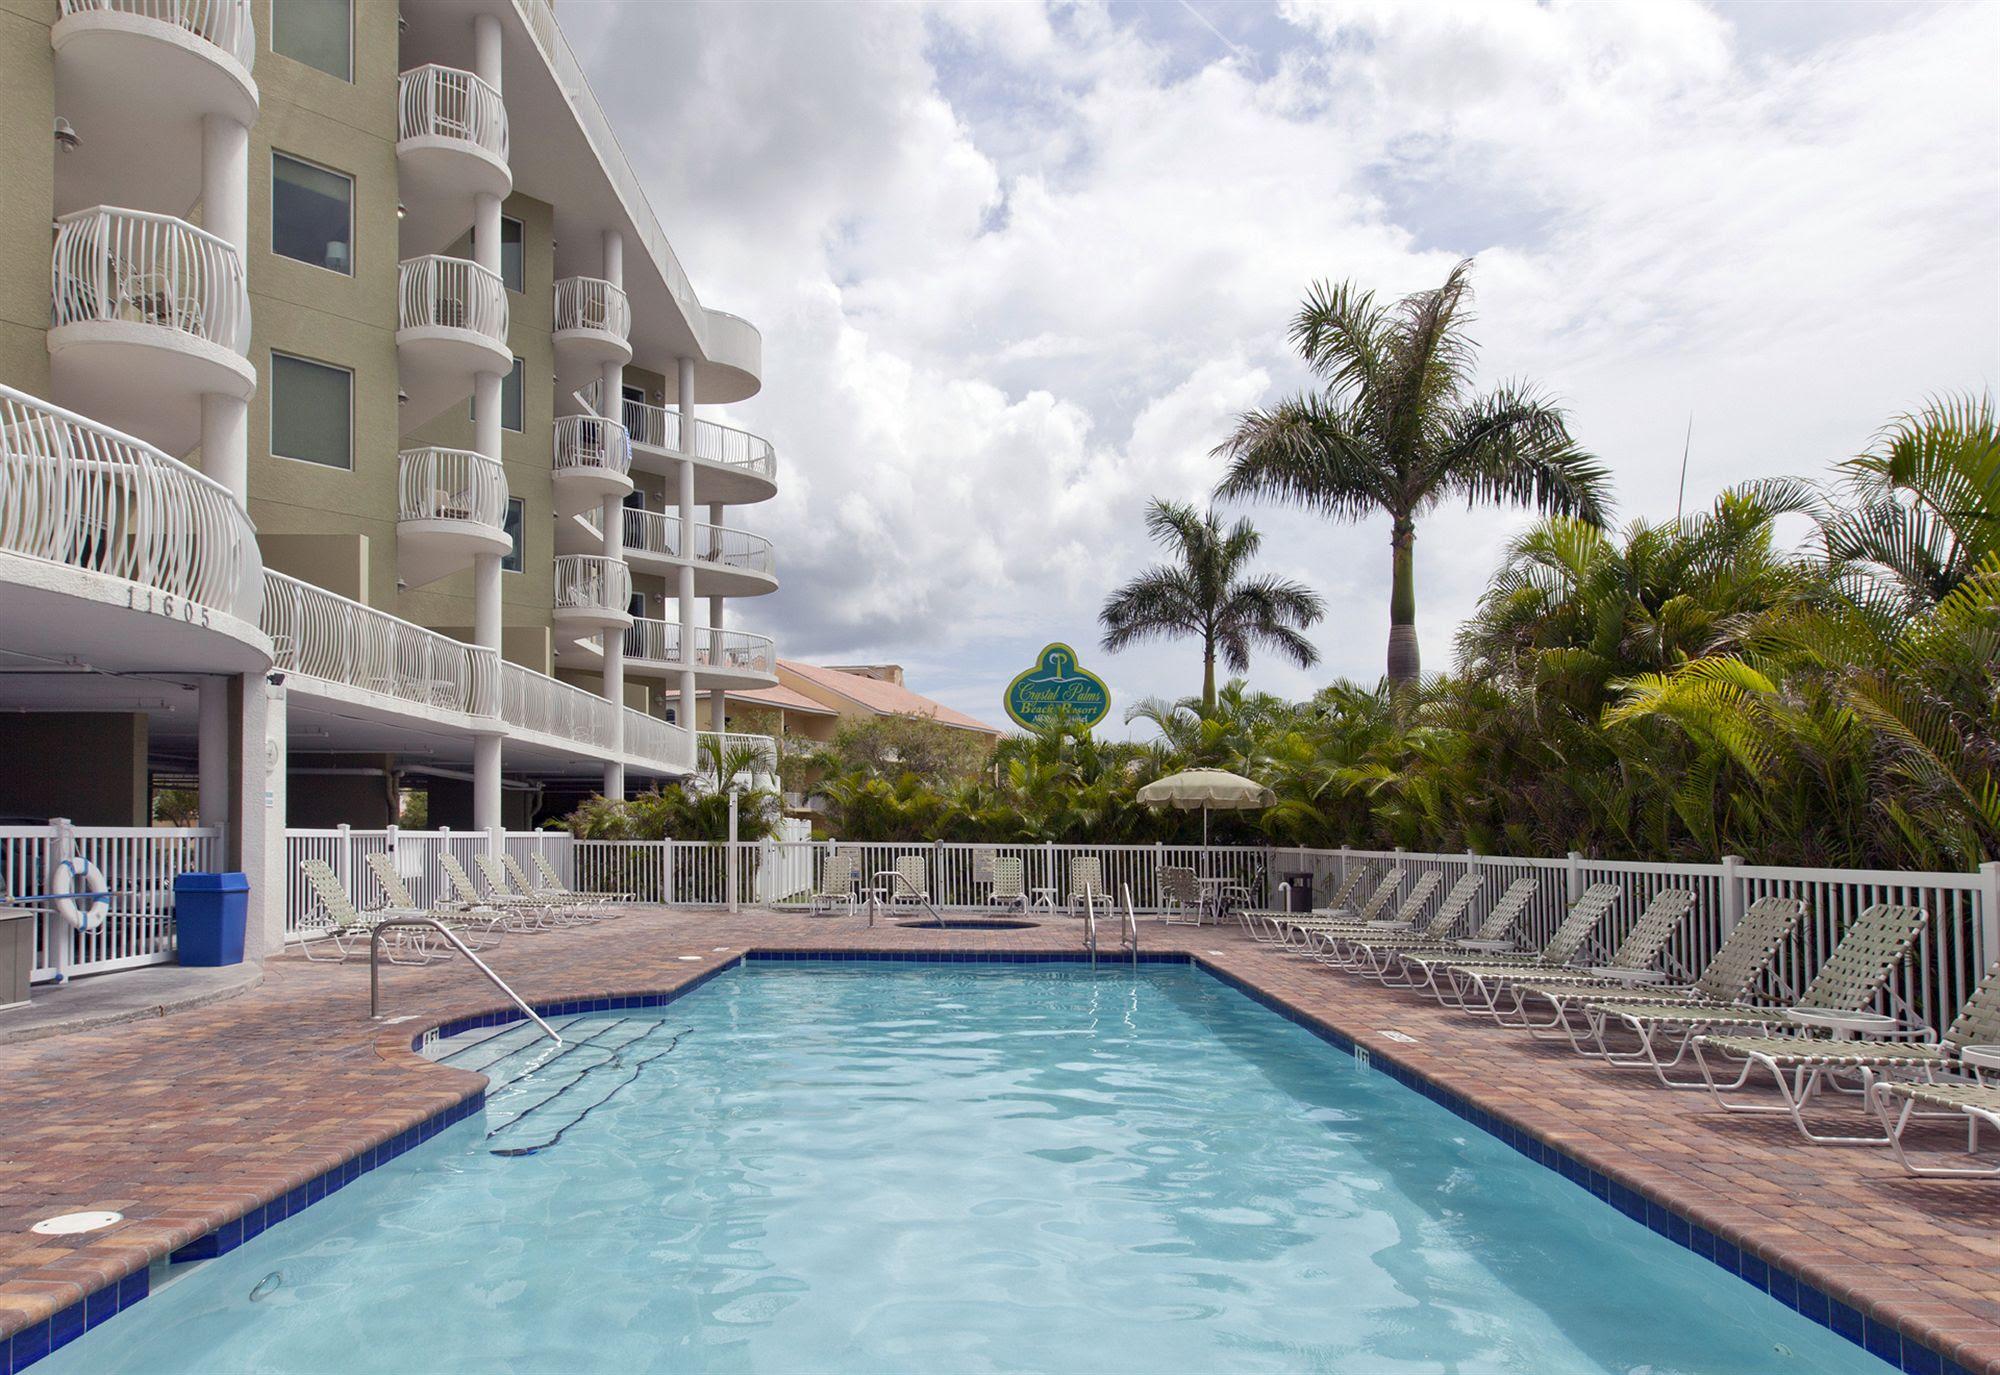 Treasure Island Hotel Coupons for Treasure Island Florida